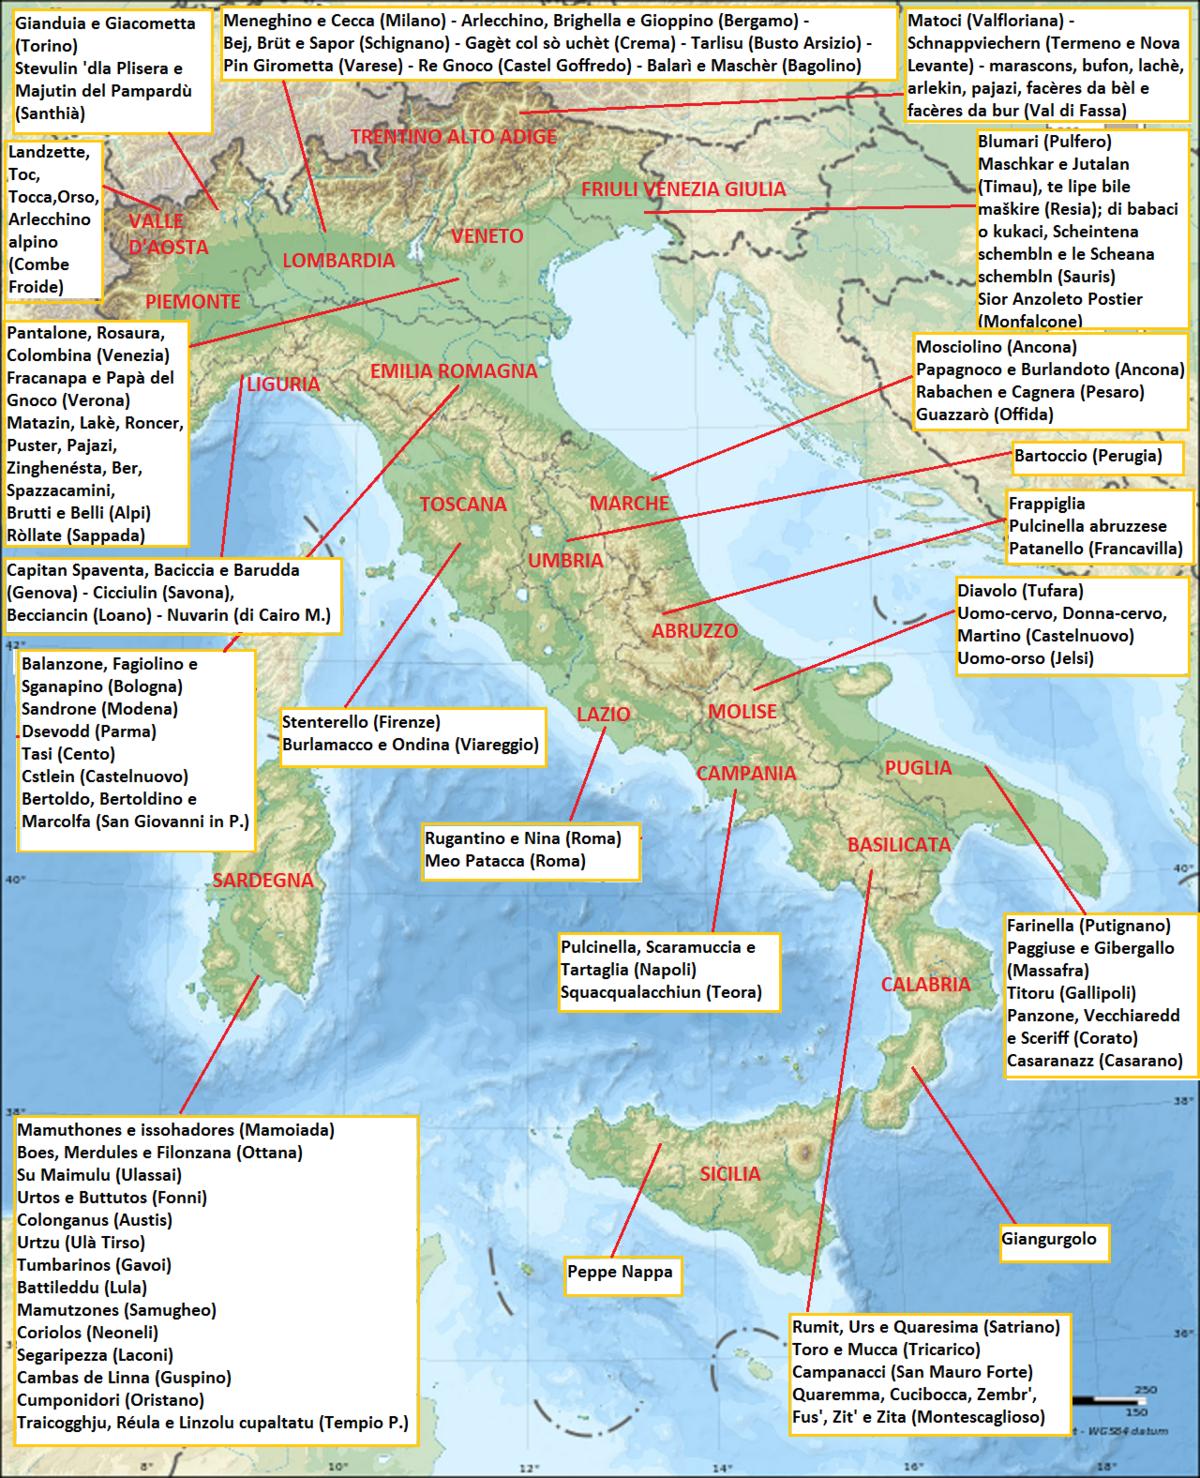 Maschere Regionali Italiane Wikipedia